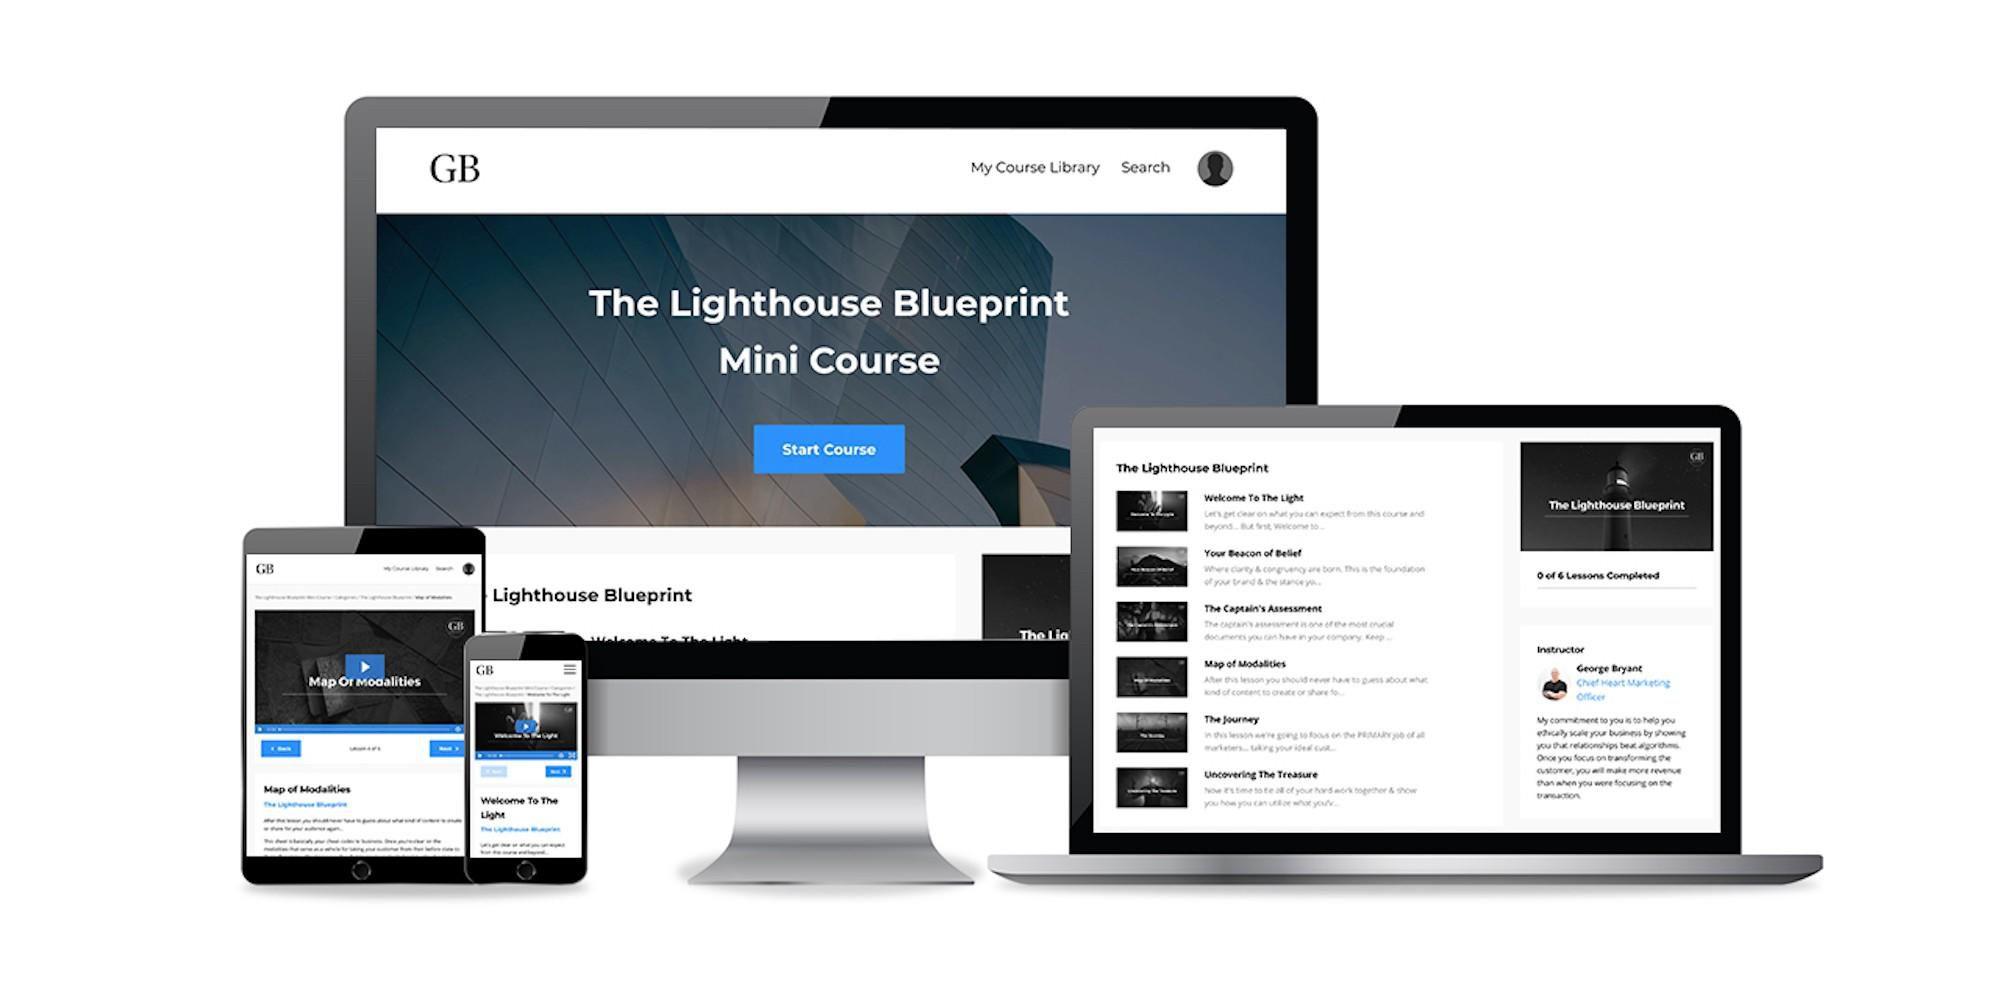 5m8zdhZuQYKtVYVsX1px_Lighthouse_Blueprint_Digital_Image